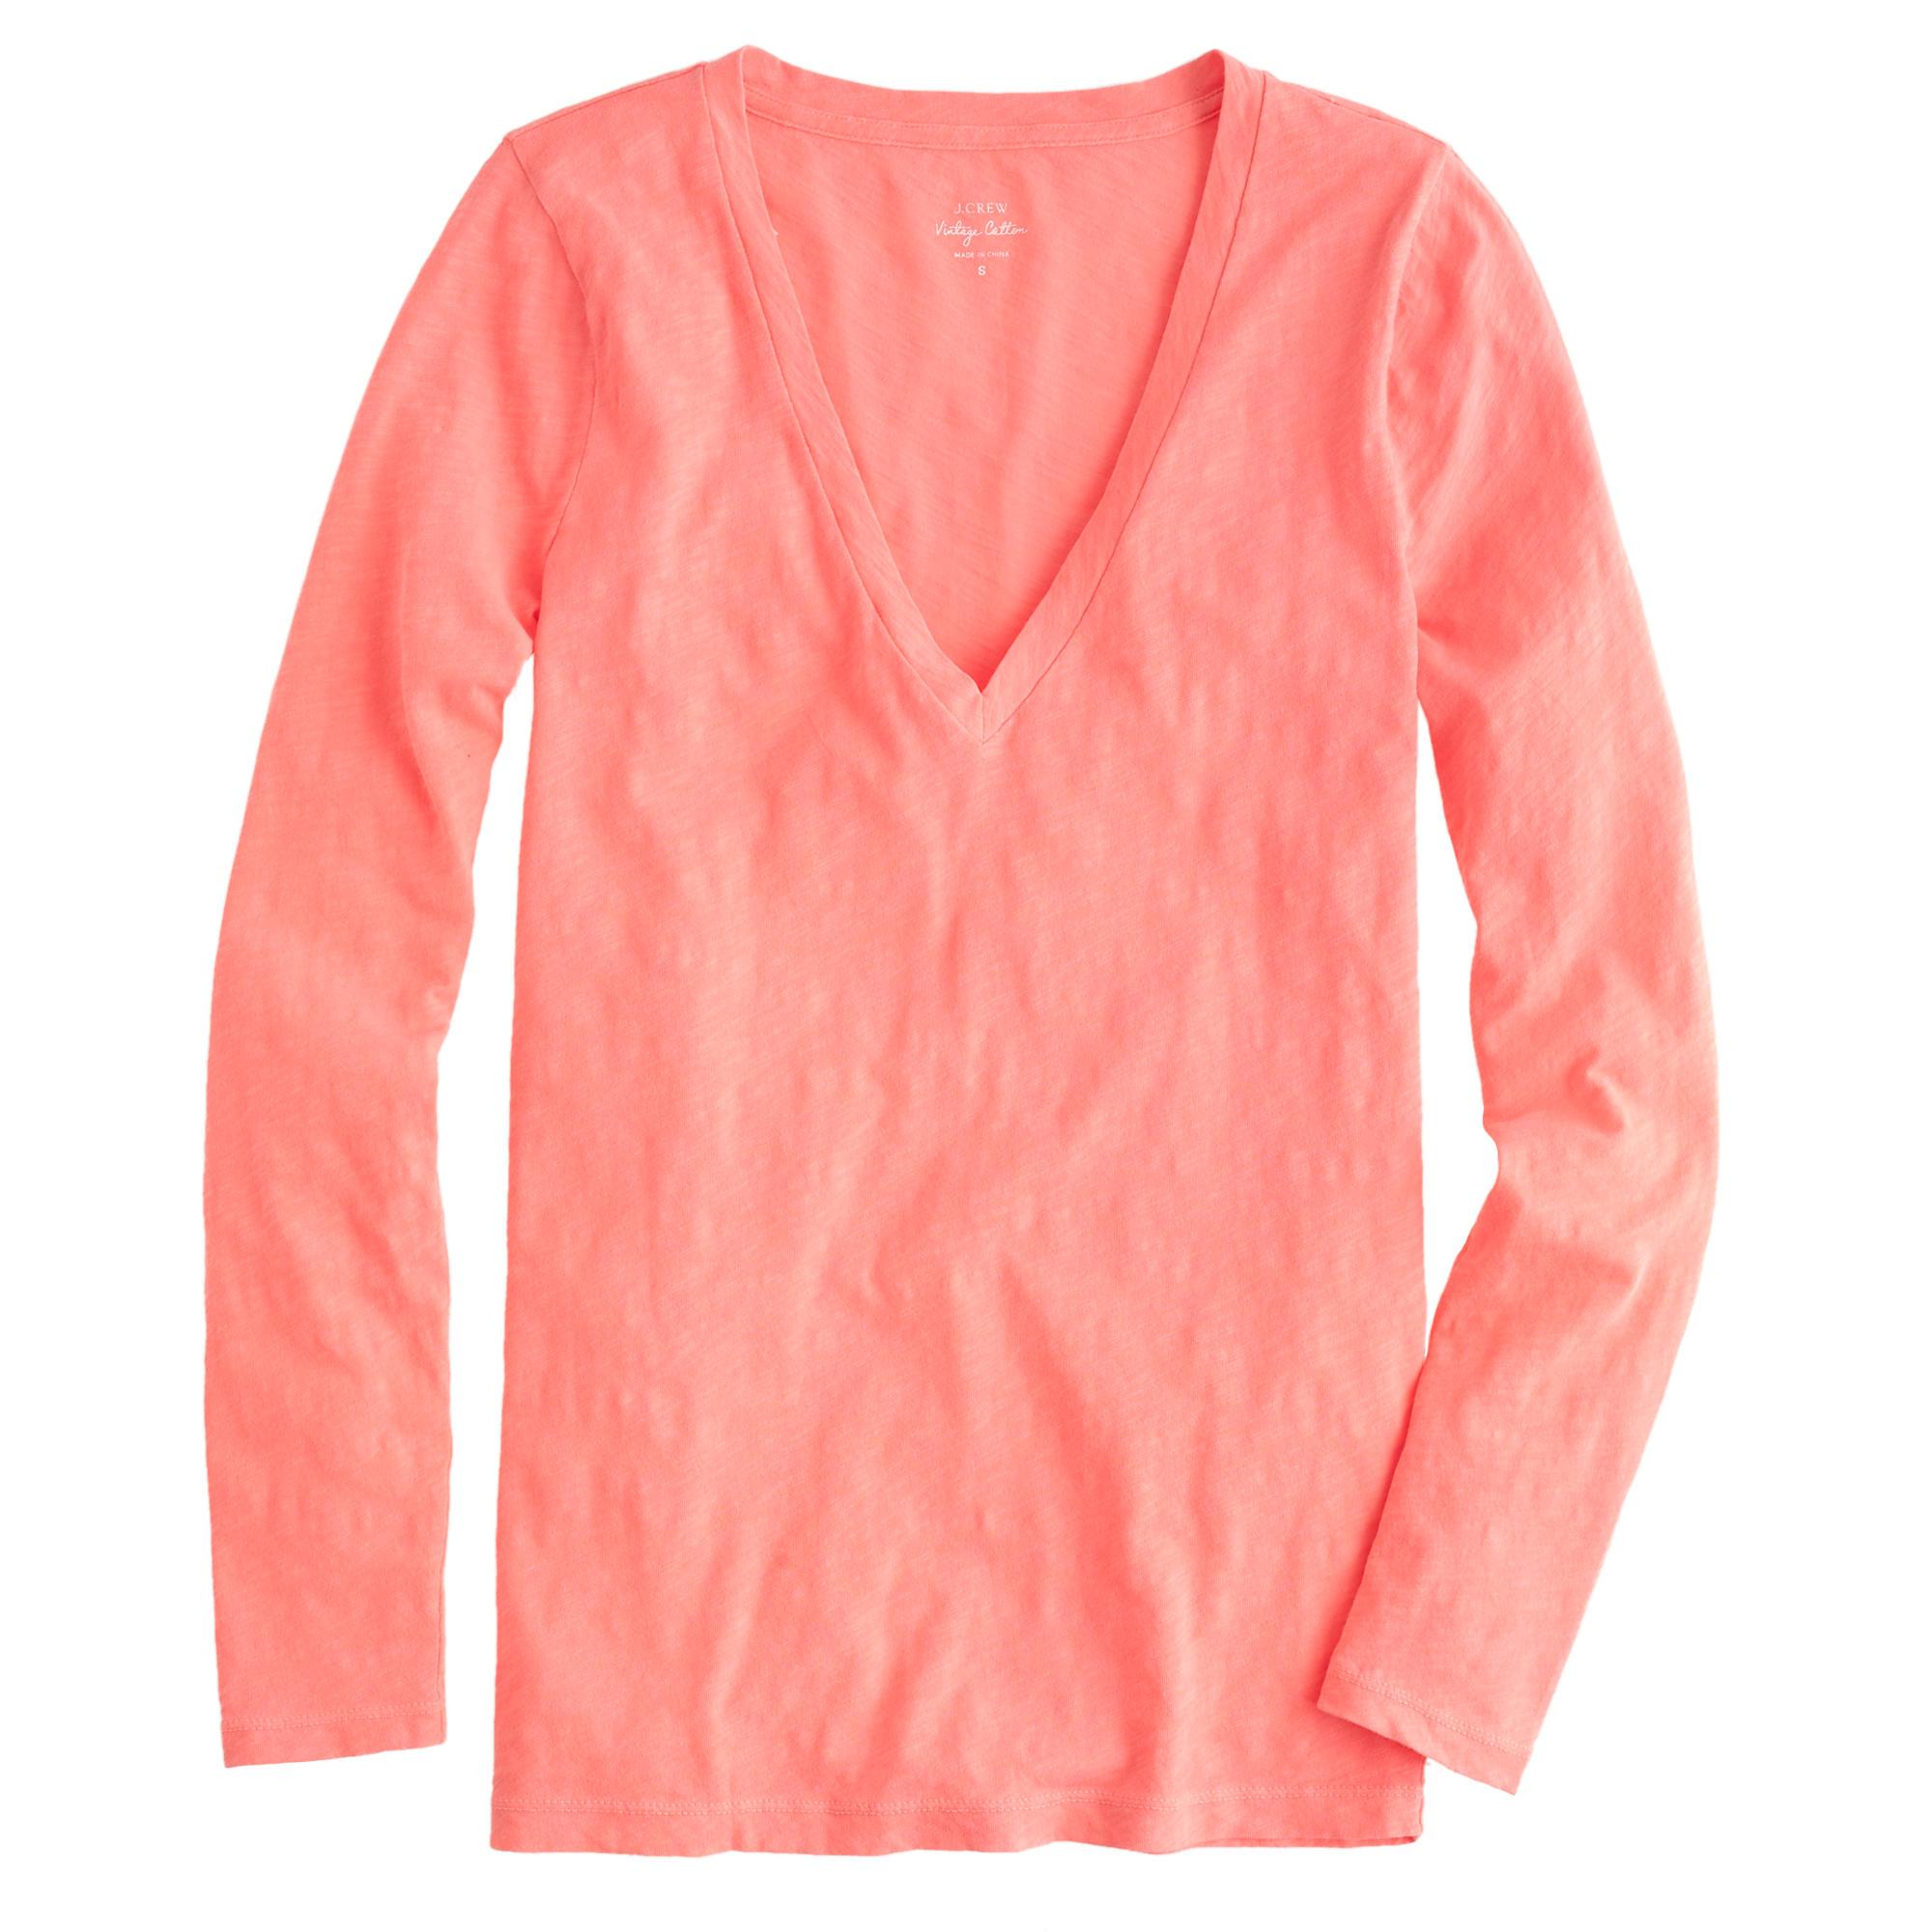 Vintage cotton long sleeve v neck t shirt in pink for Cotton long sleeve v neck t shirts